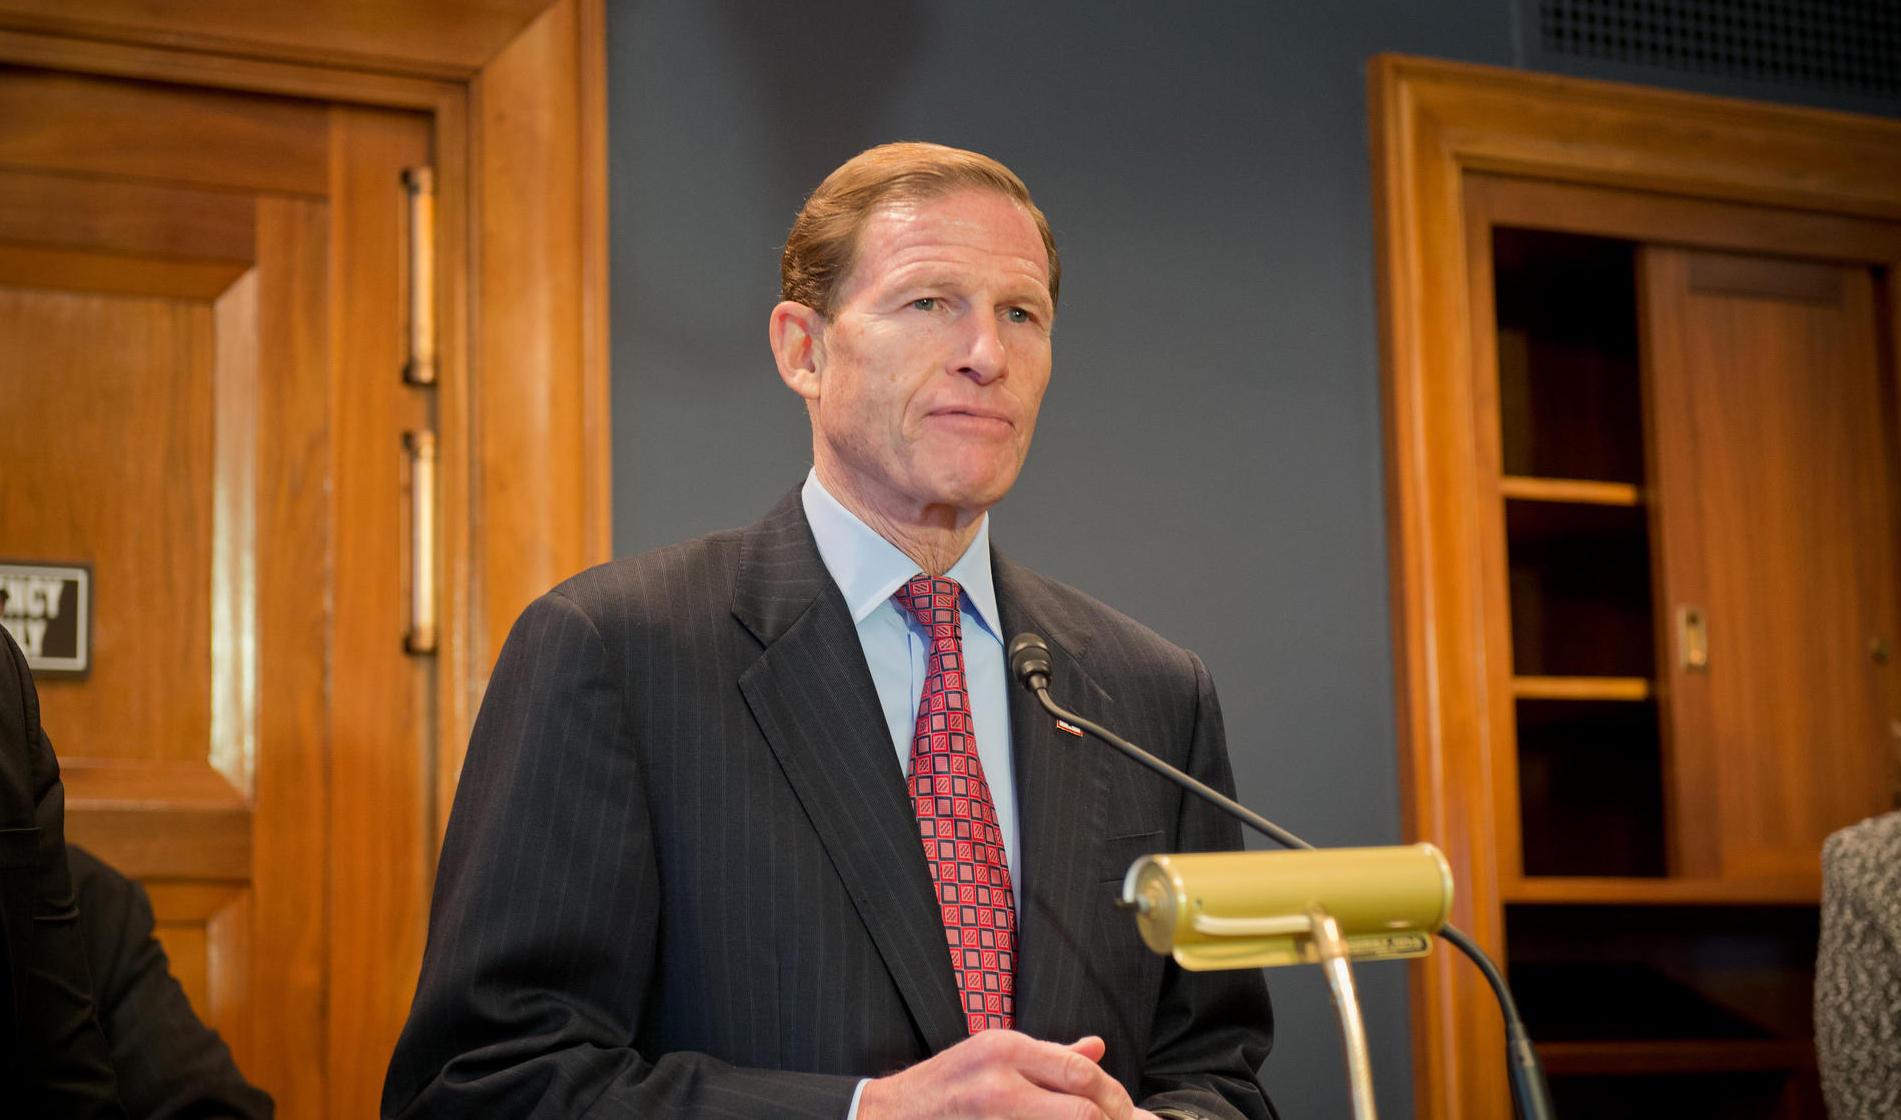 Sens. Blumenthal And Graham Introduce Bipartisan Gun Bill